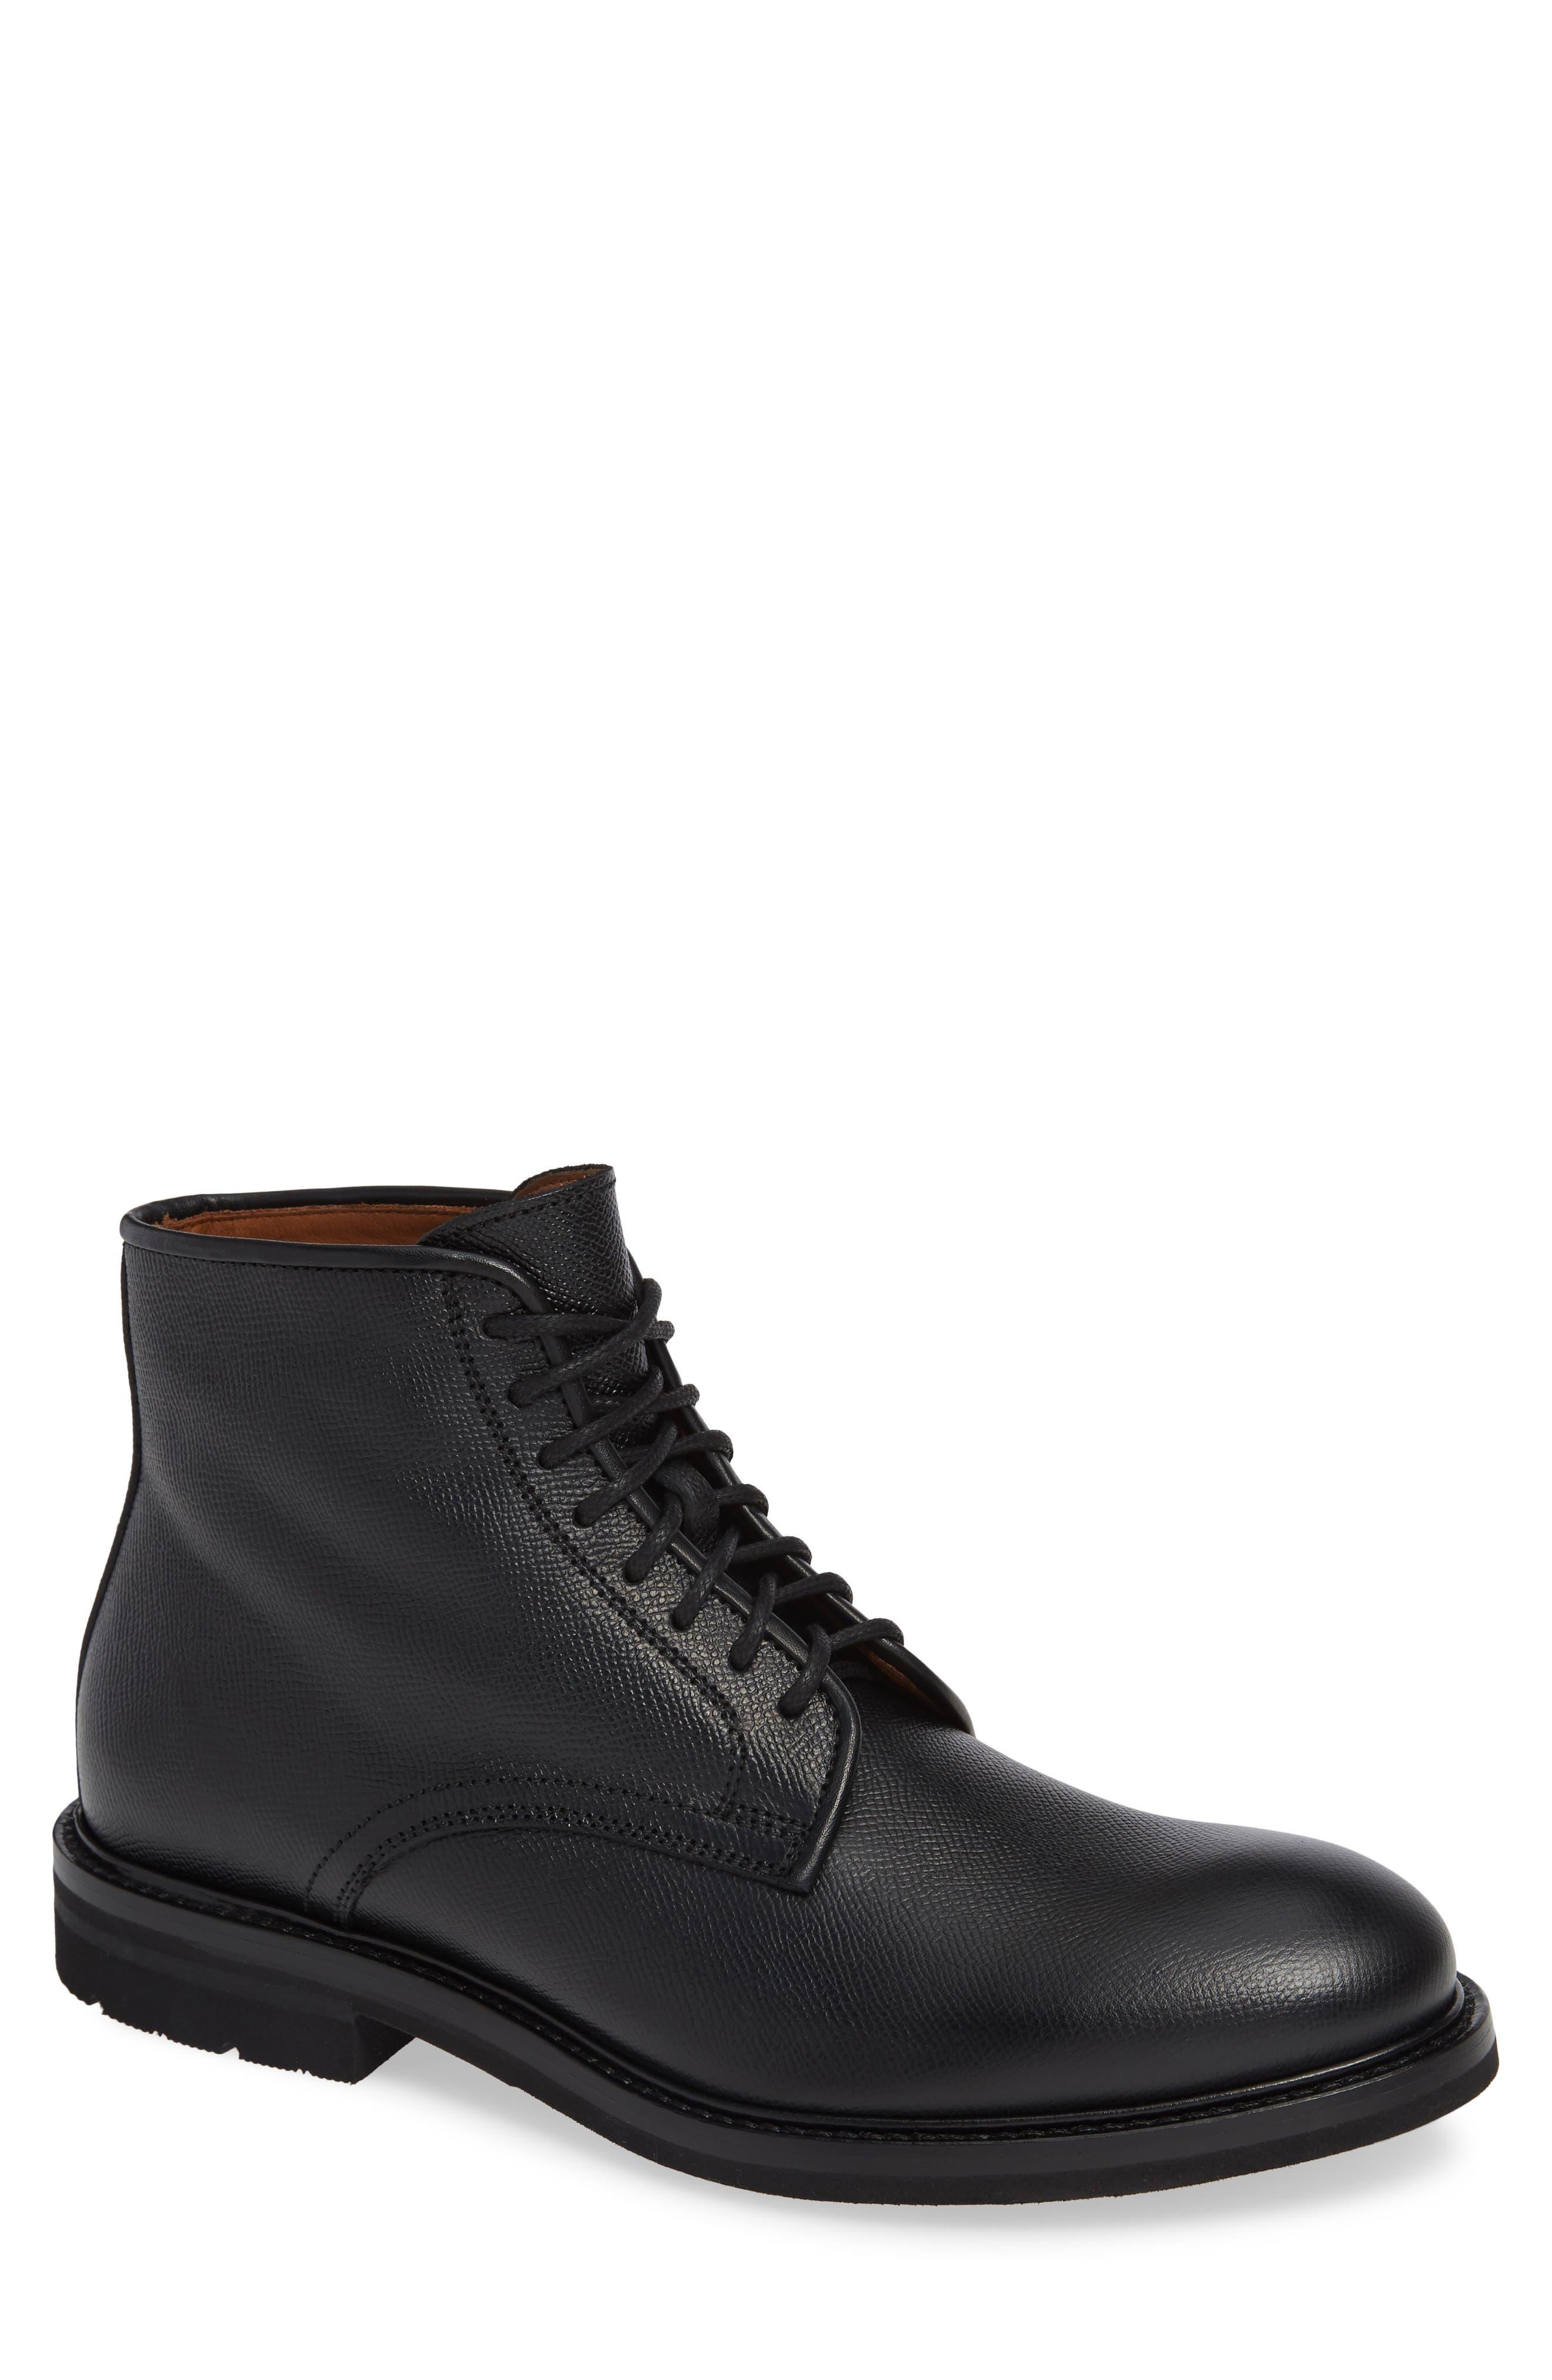 Renzo Weatherproof Plain Toe Waterproof Boot,                         Main,                         color, BLACK